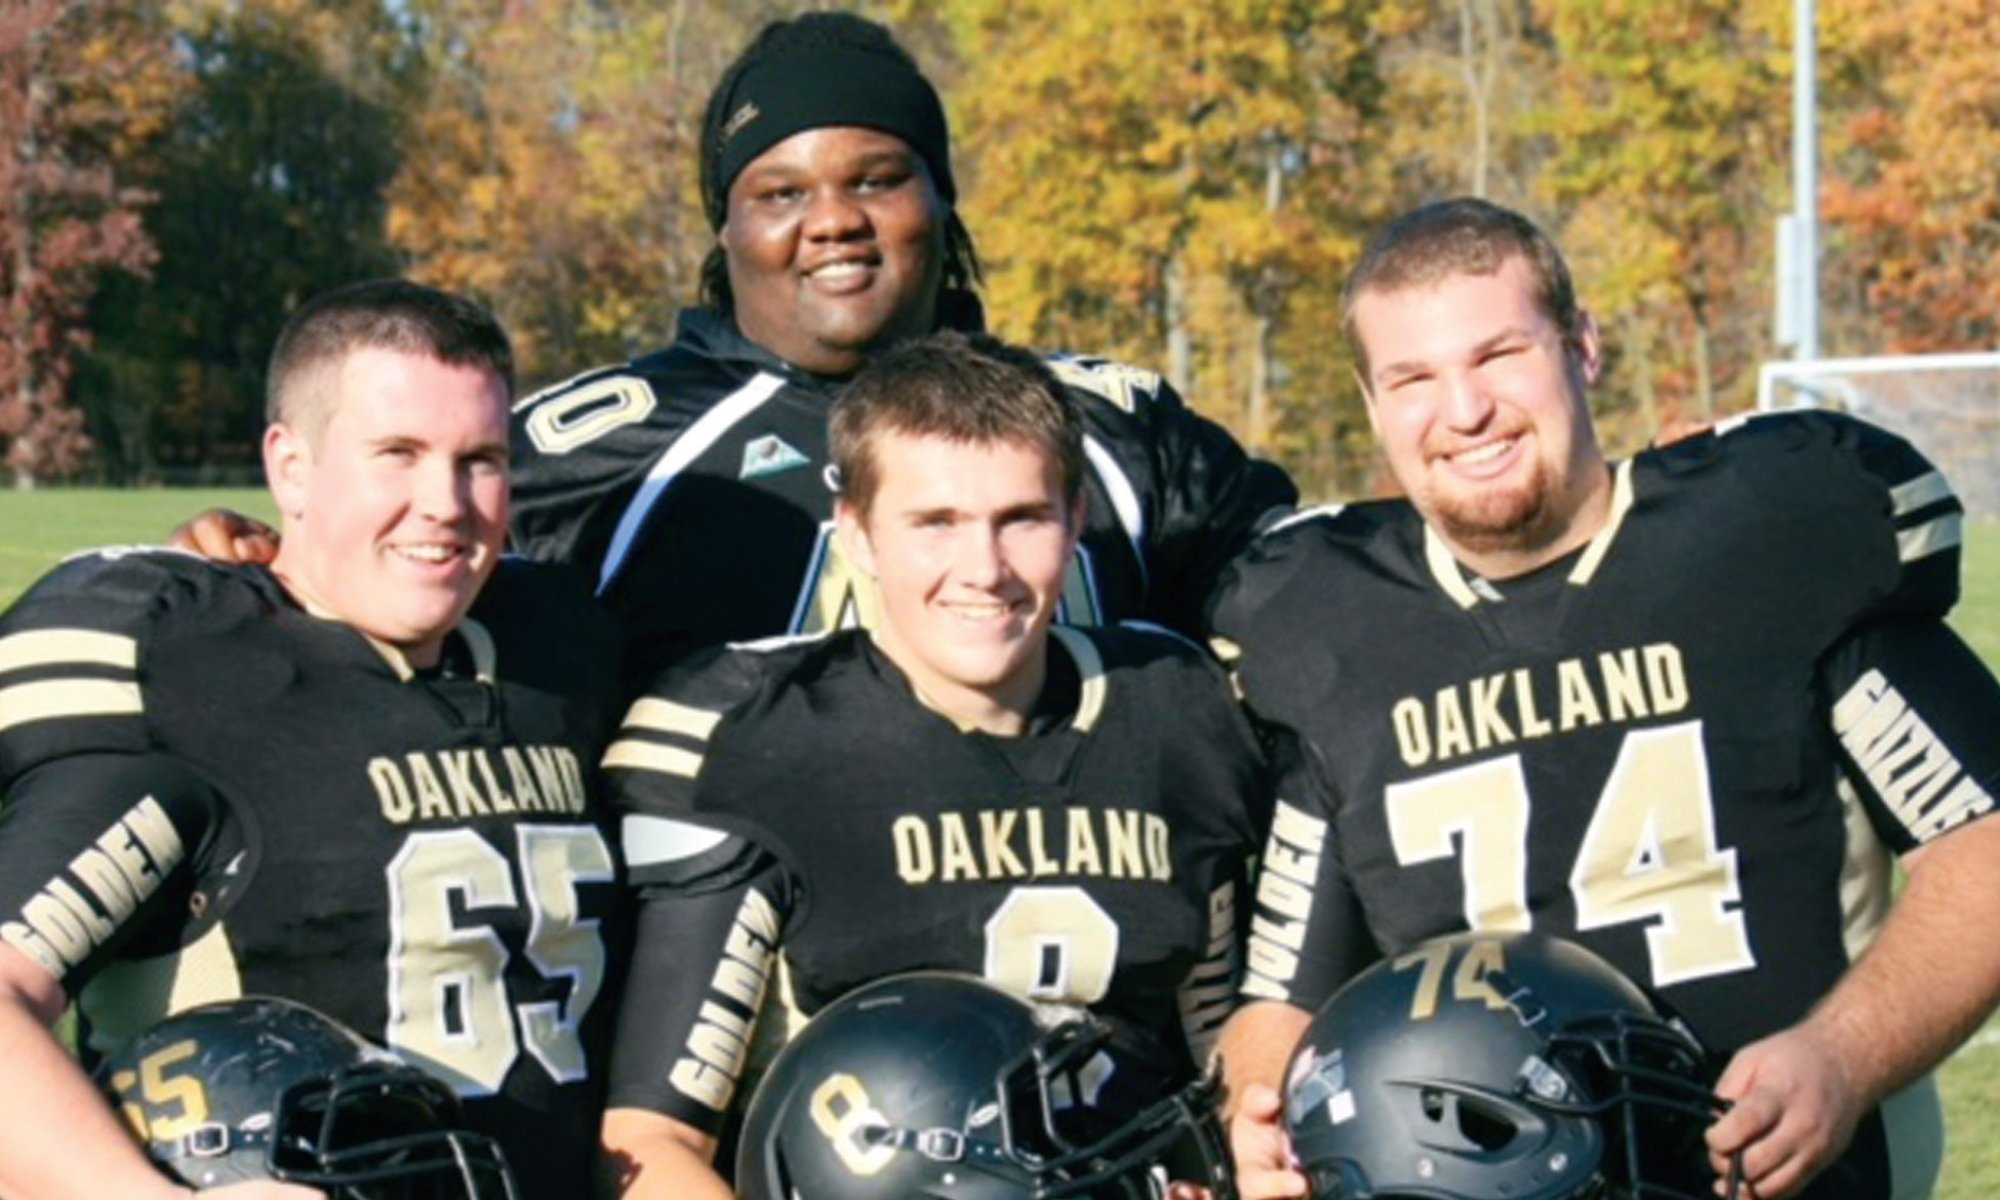 four men in Oakland University football uniforms, holding helmets